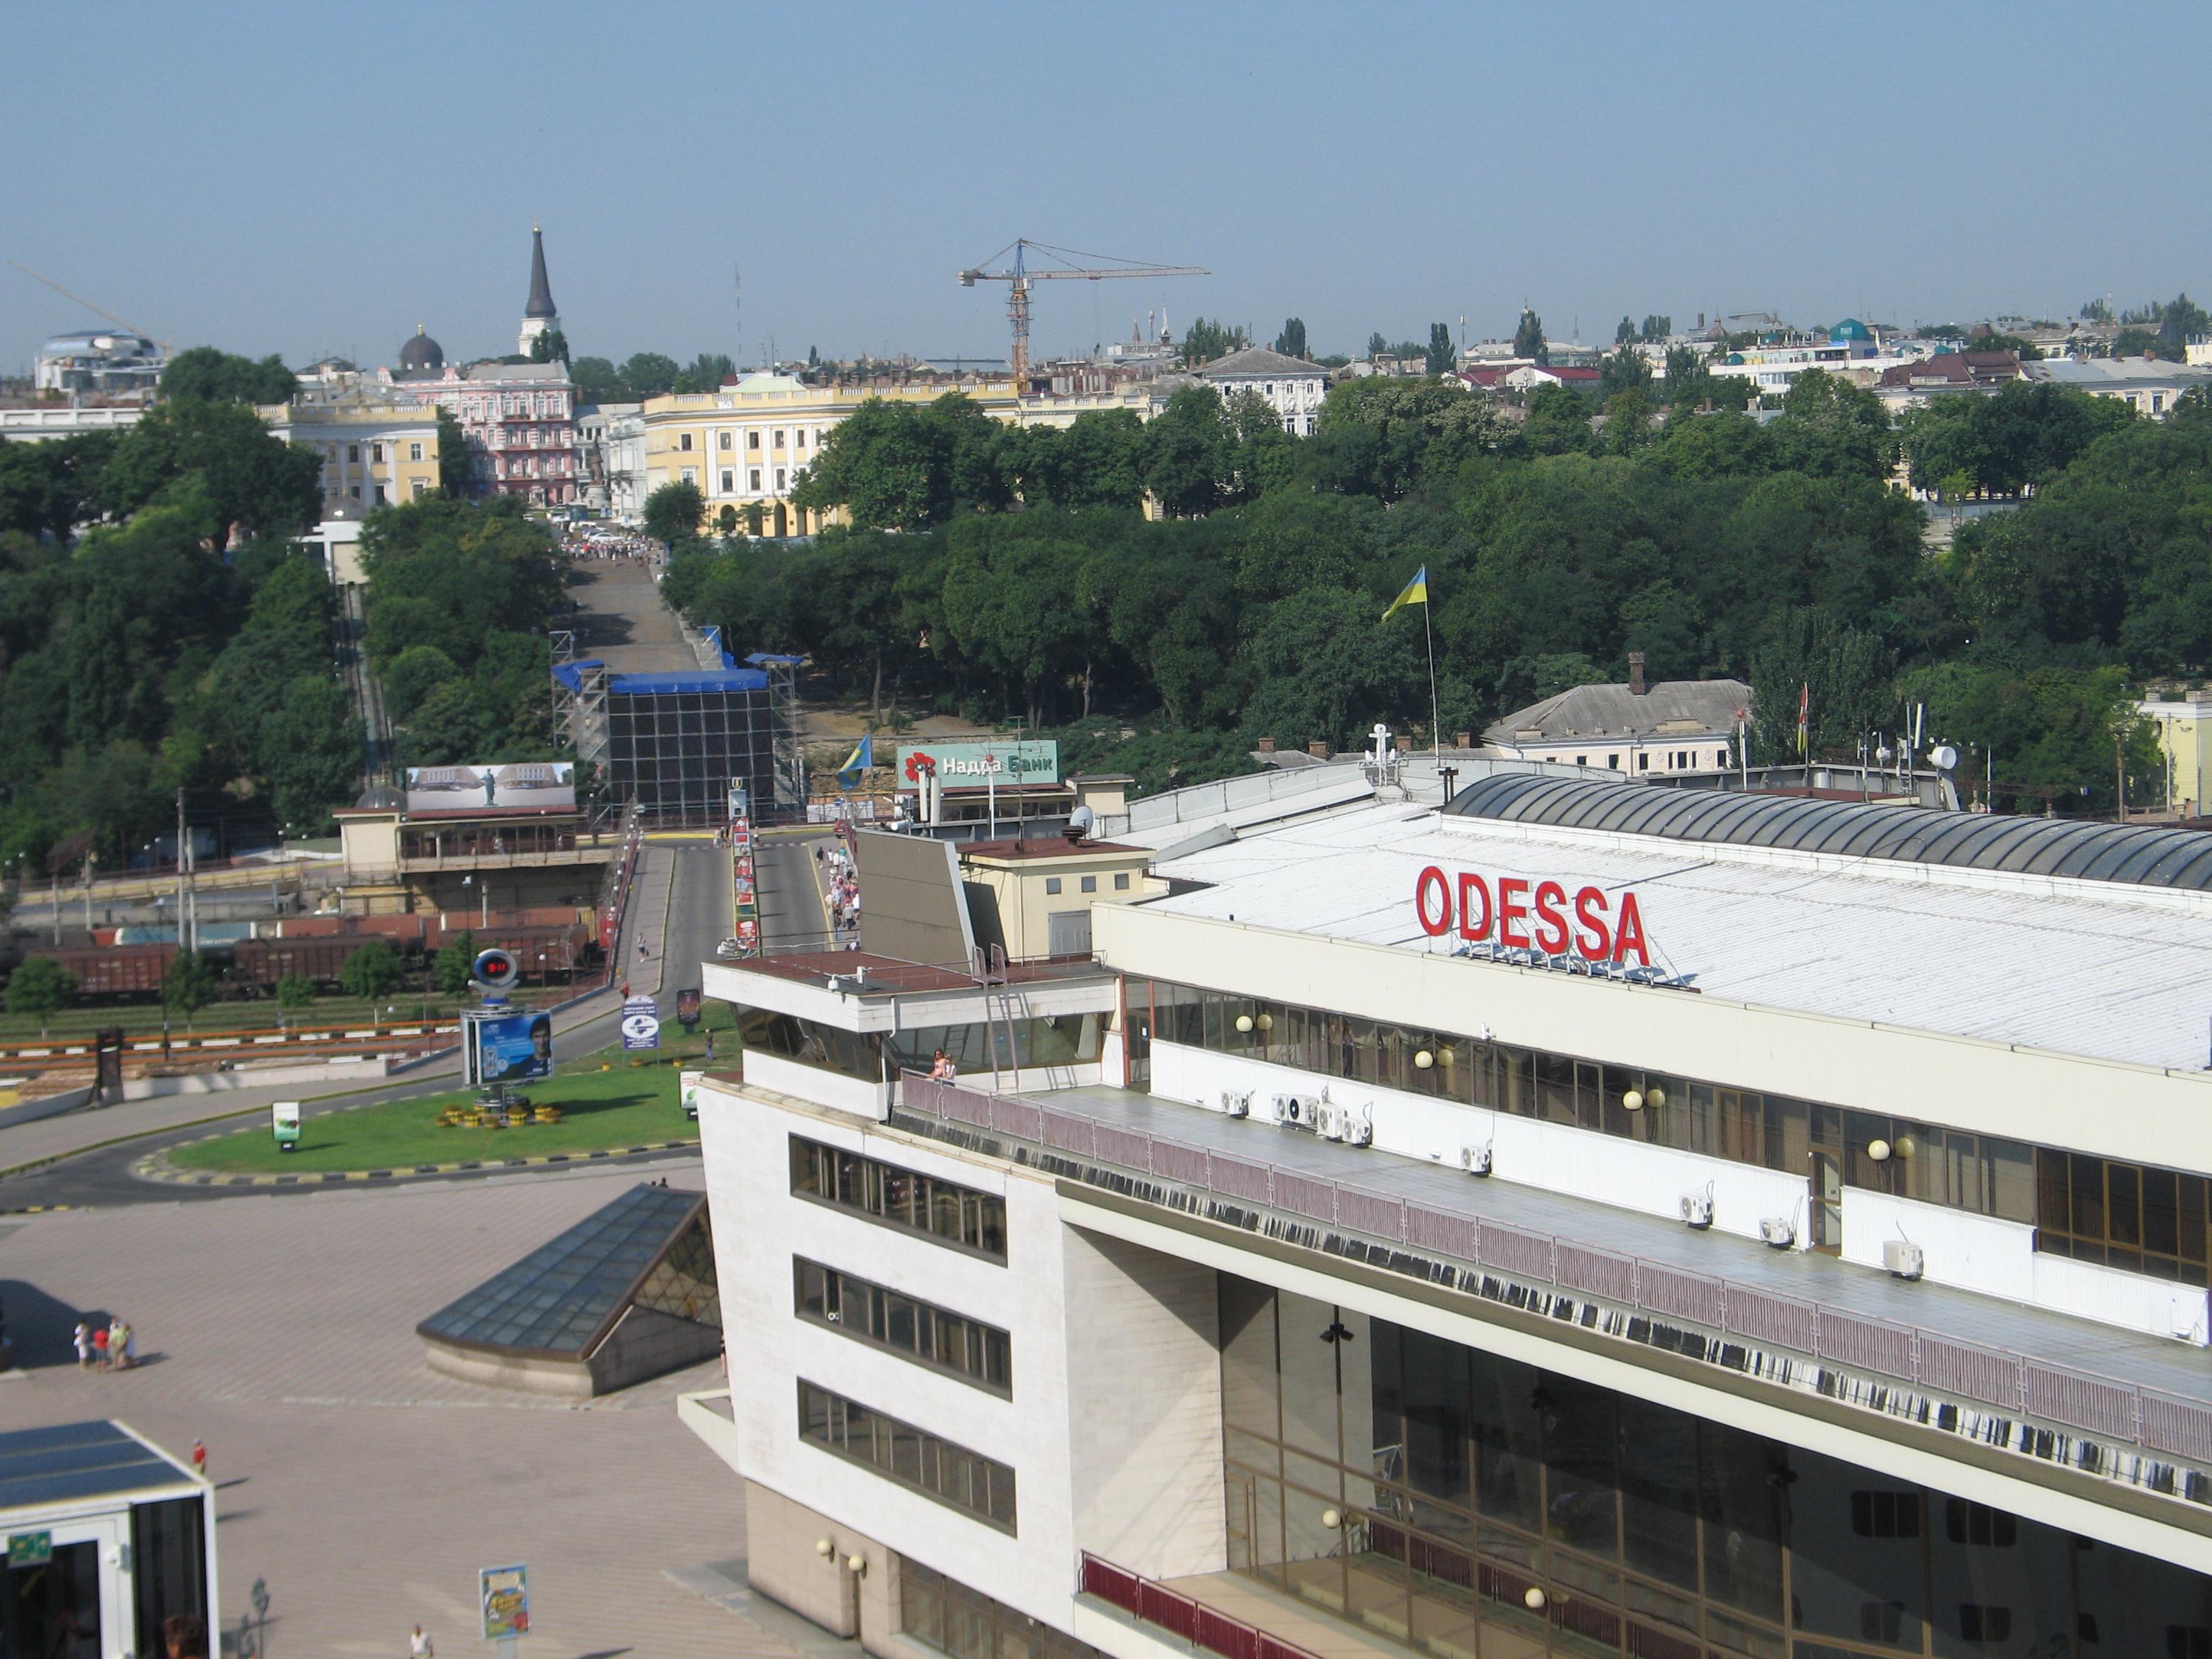 Odessa (Ukraina)